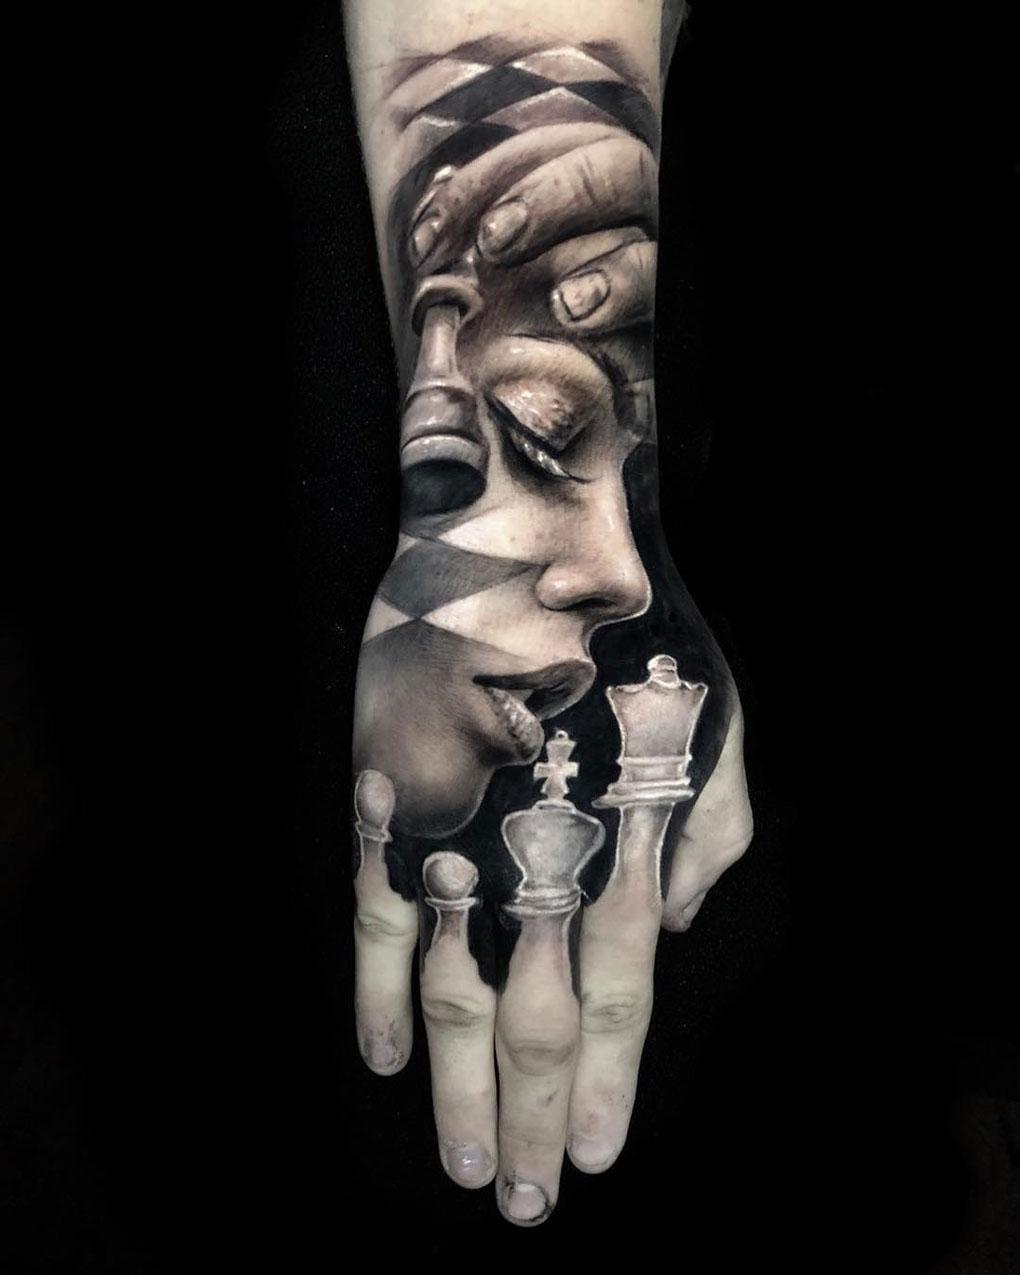 Hand tattoo with portrait